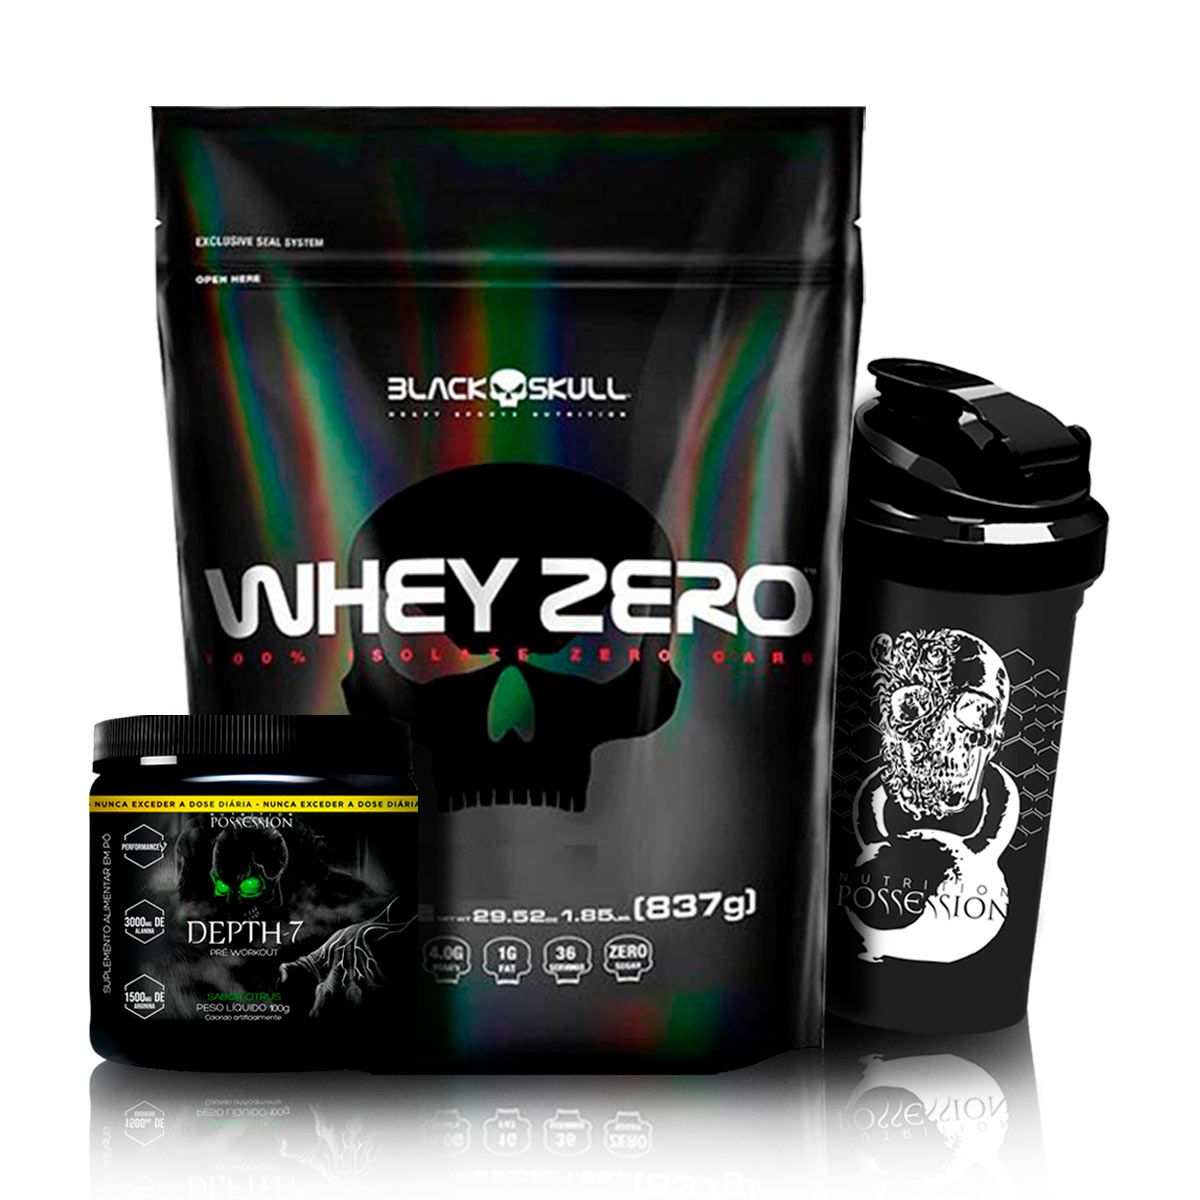 Kit Whey zero 837g Refil + Pré Treino Depth-7 100g - Black Skull